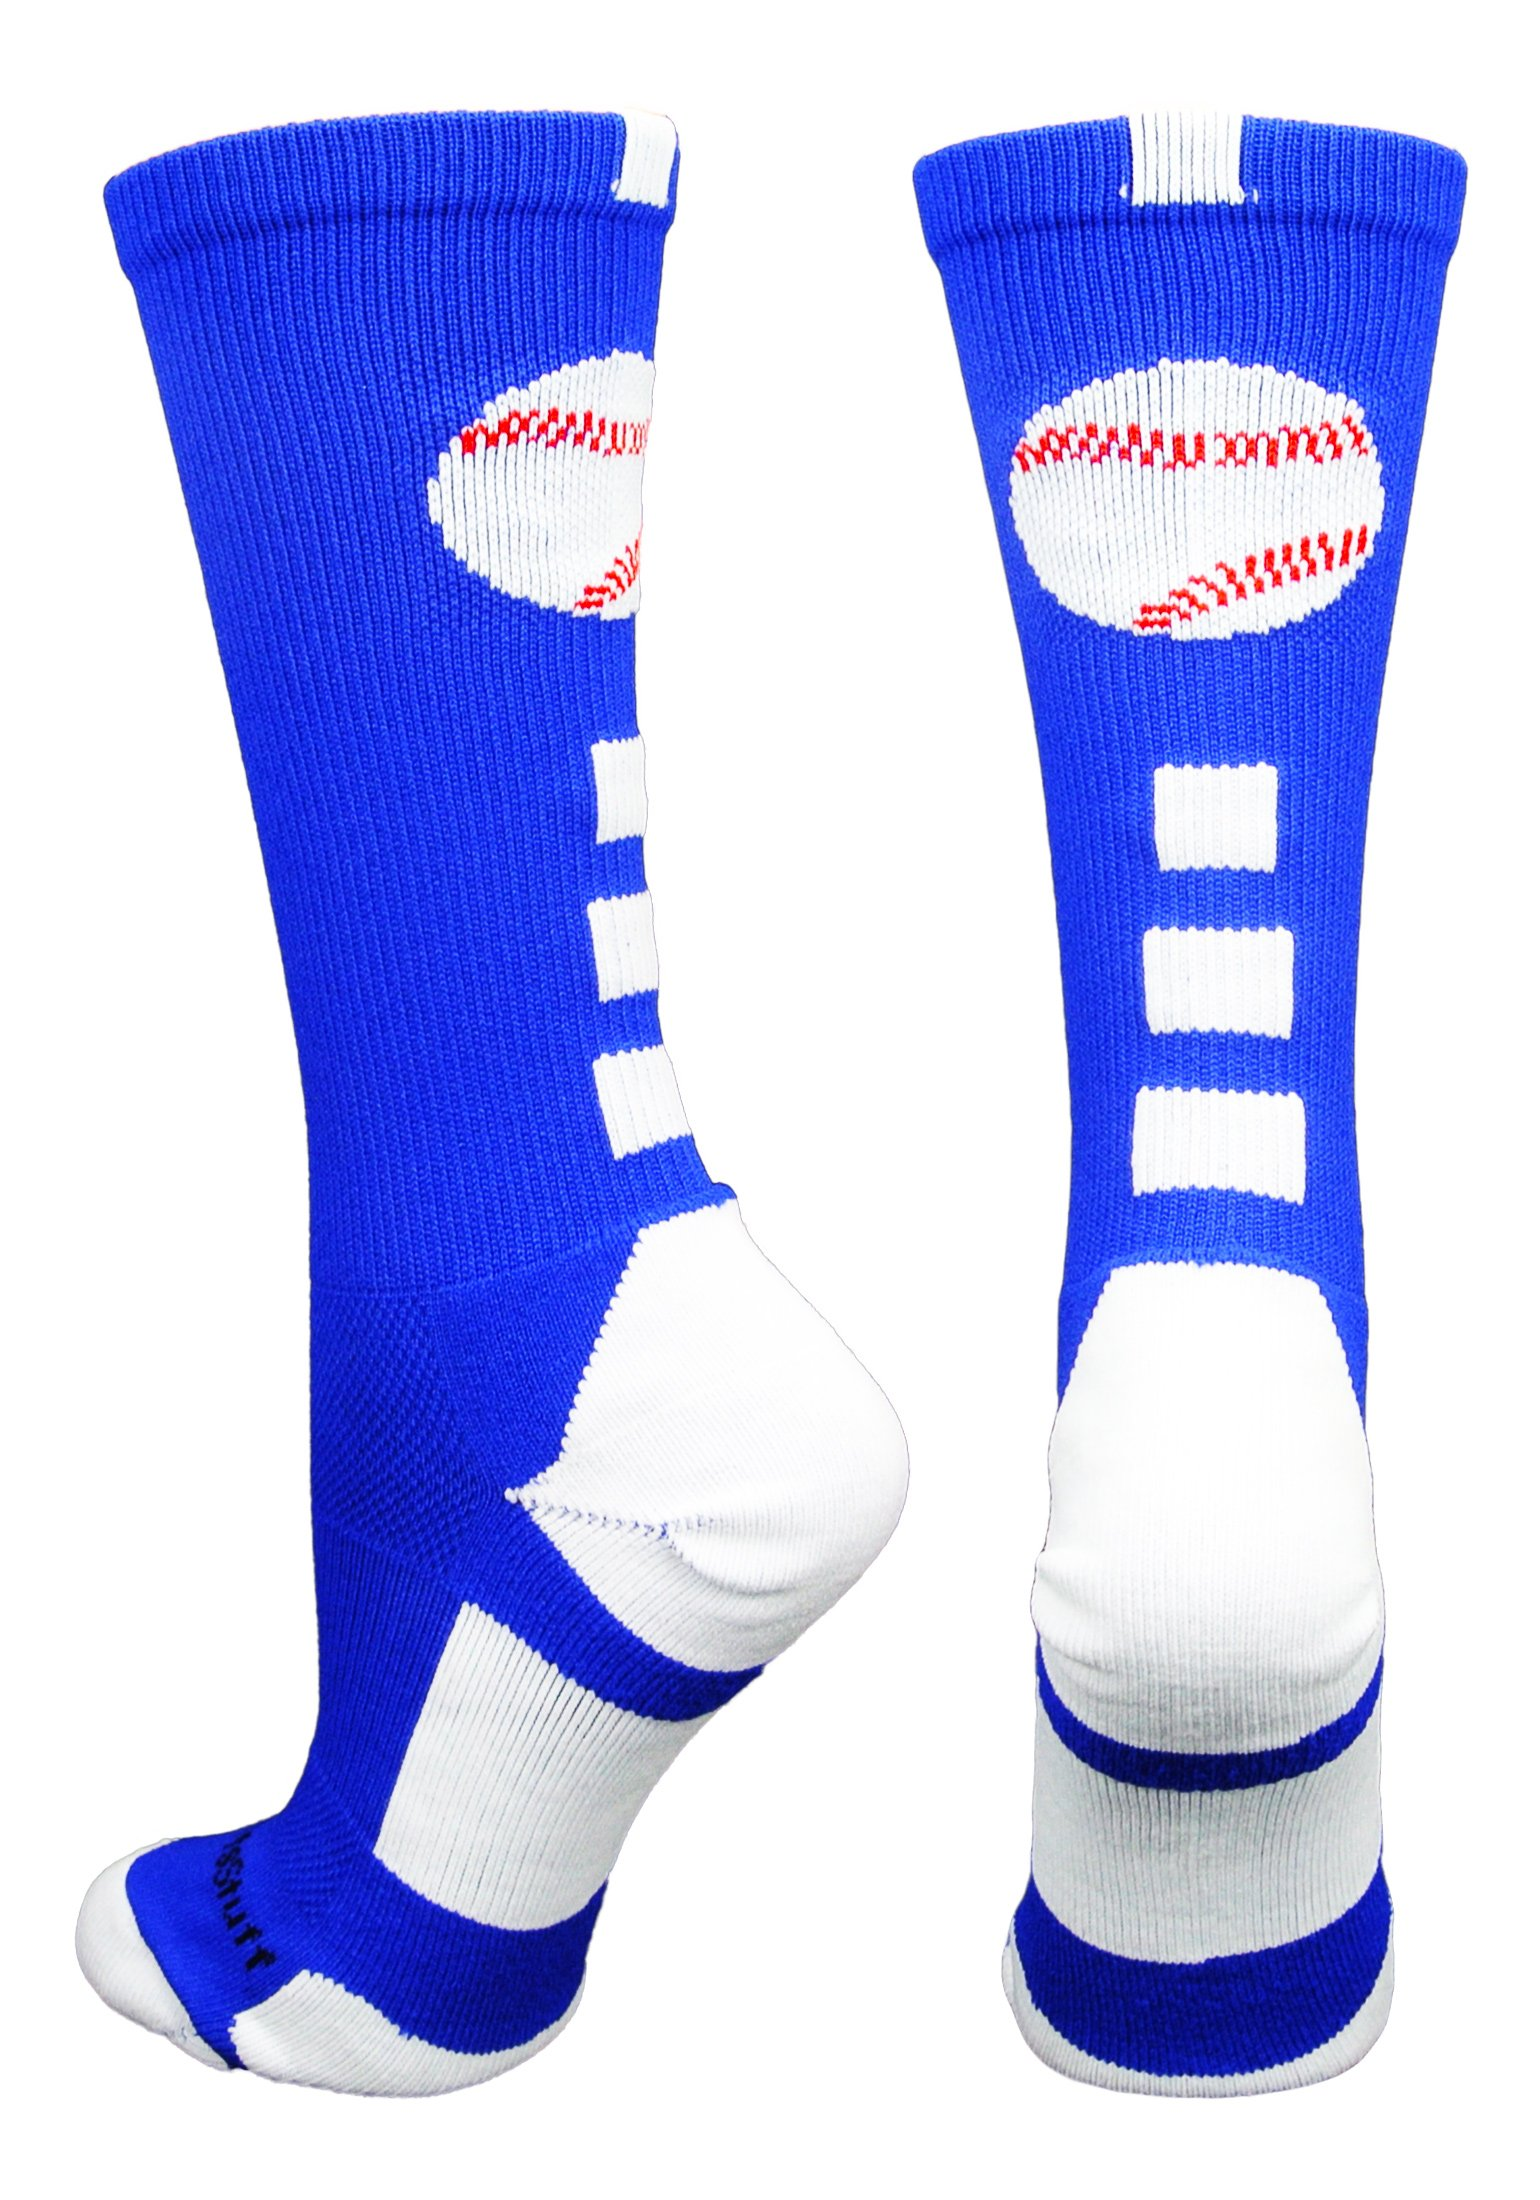 MadSportsStuff Baseball Logo Crew Socks (Royal/White, Medium) by MadSportsStuff